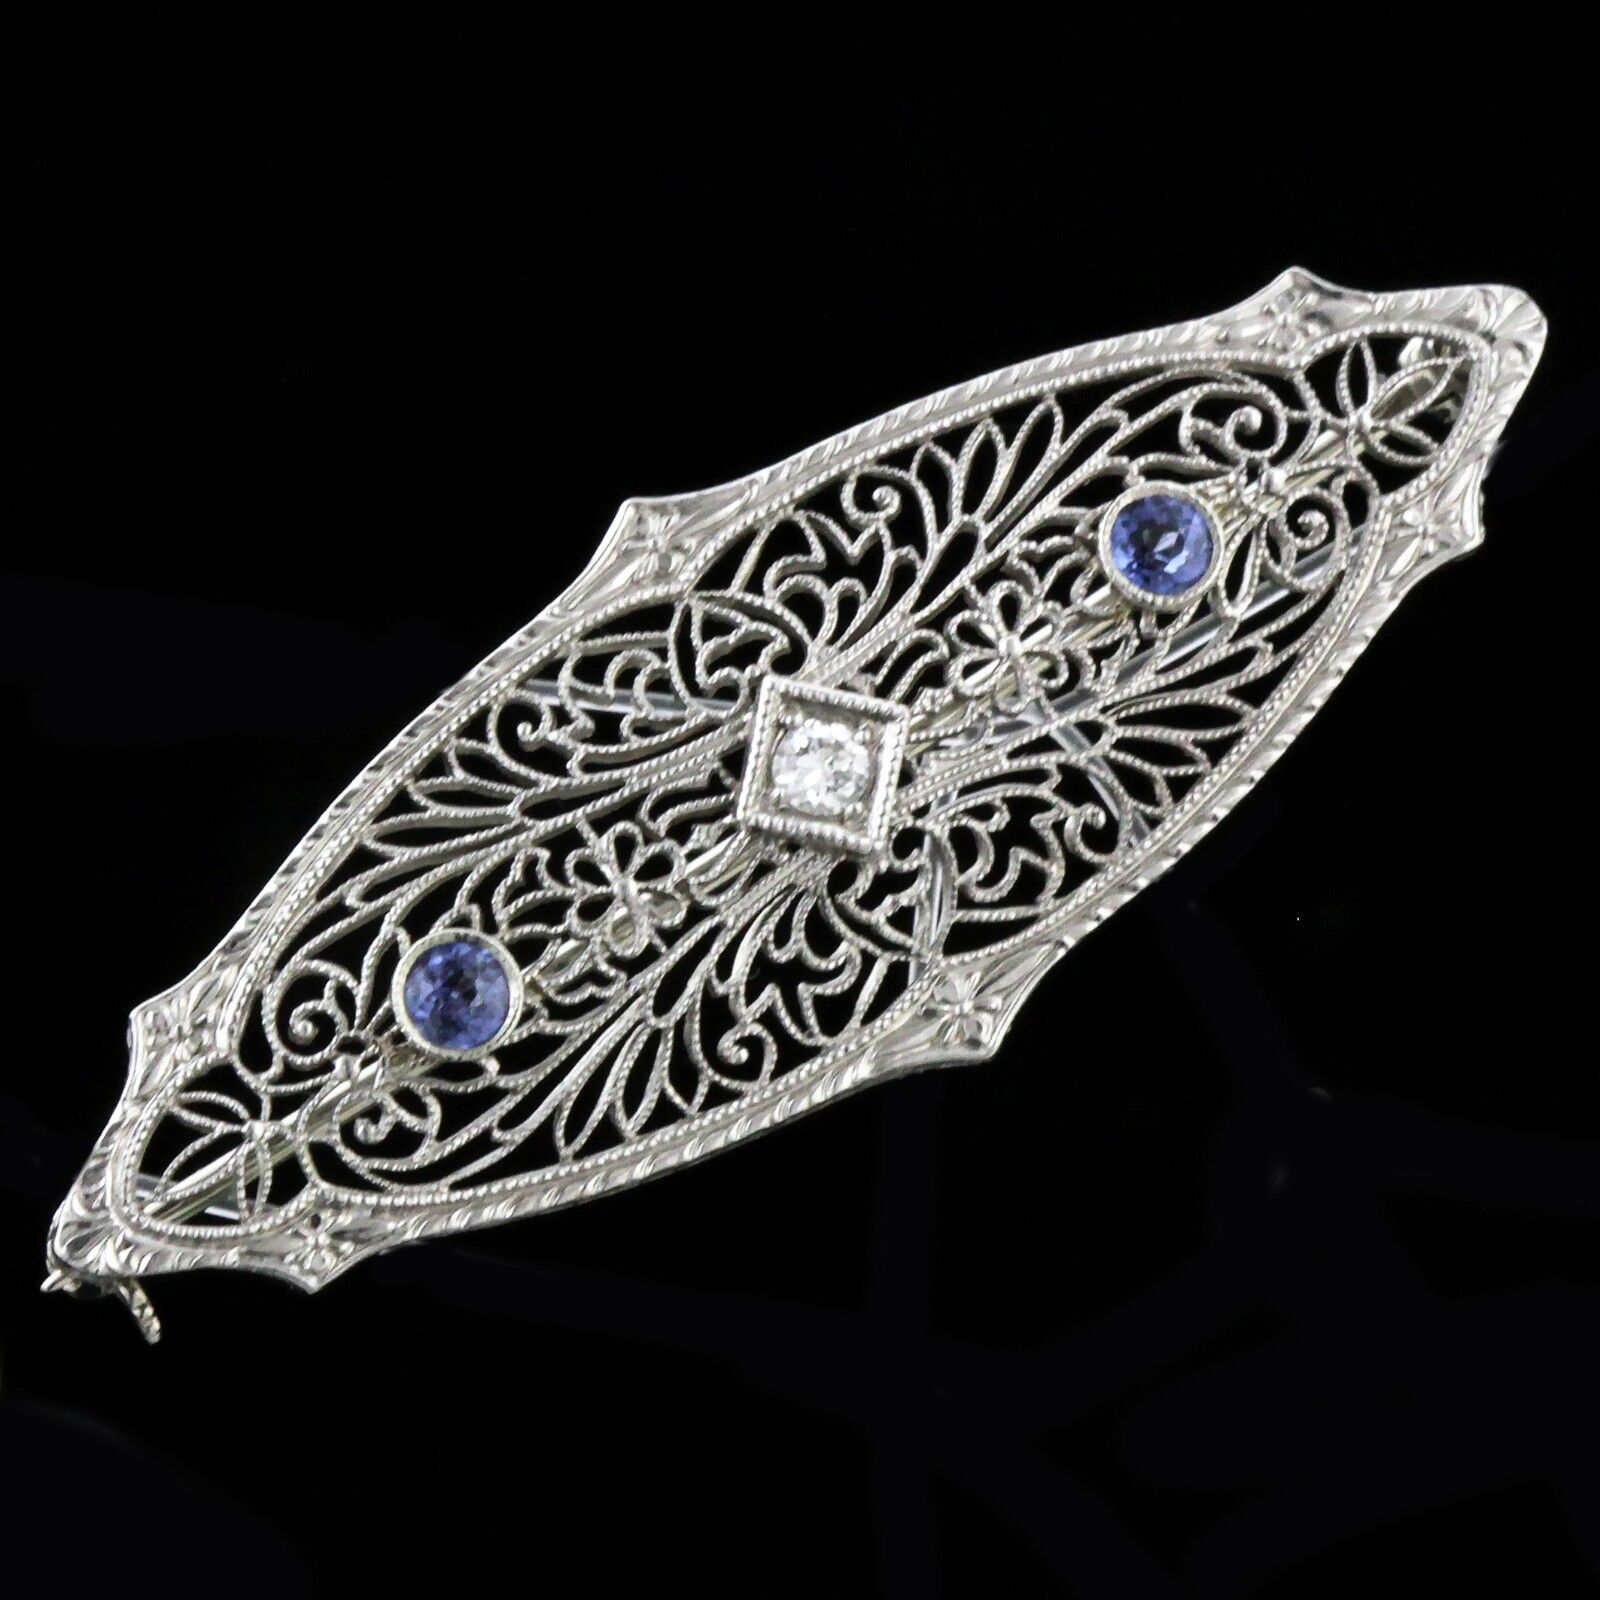 ART DECO 14KT WHITE gold FILIGREE NATURAL SAPPHIRE AND DIAMOND PIN 1920'S